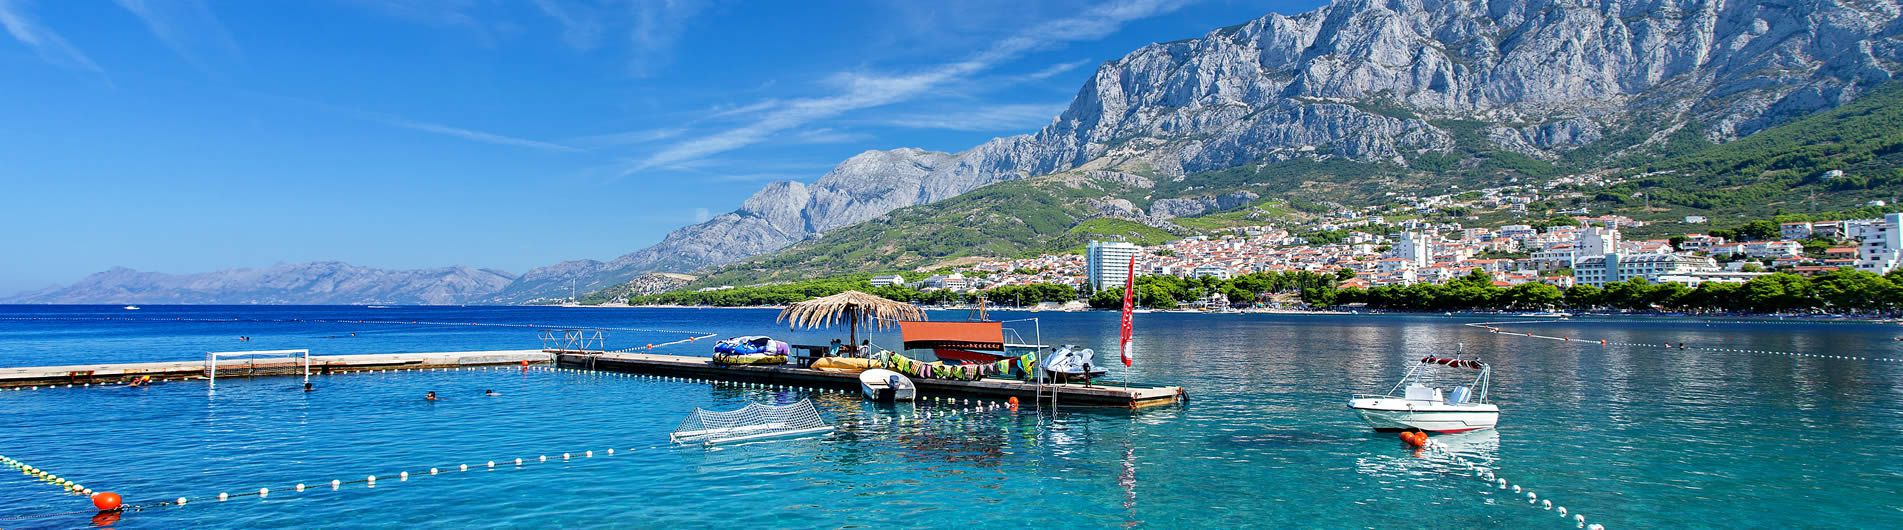 Guided Tours of Croatia